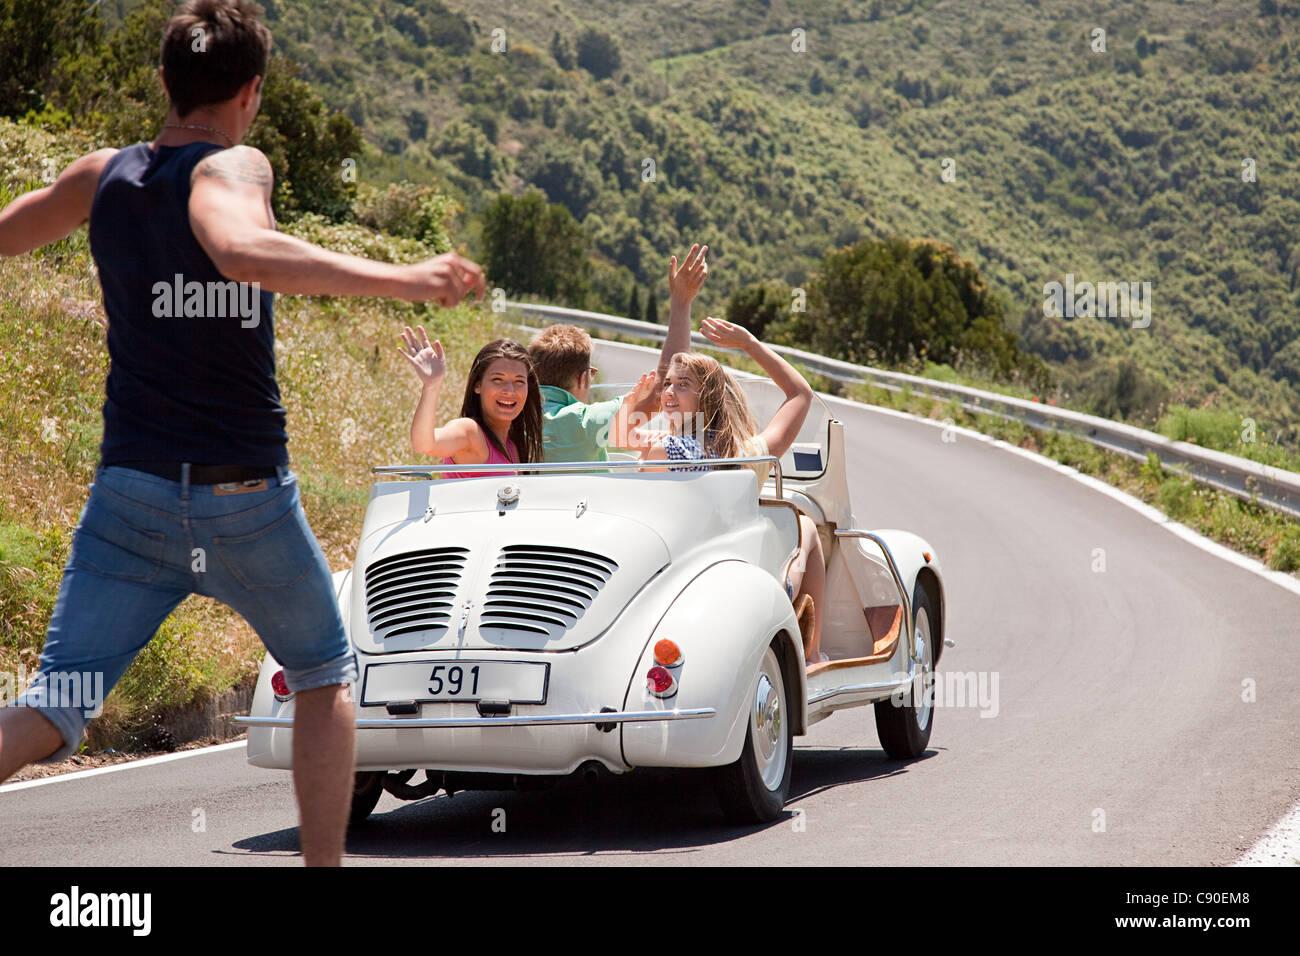 Convertible car driving past hitchhiker - Stock Image